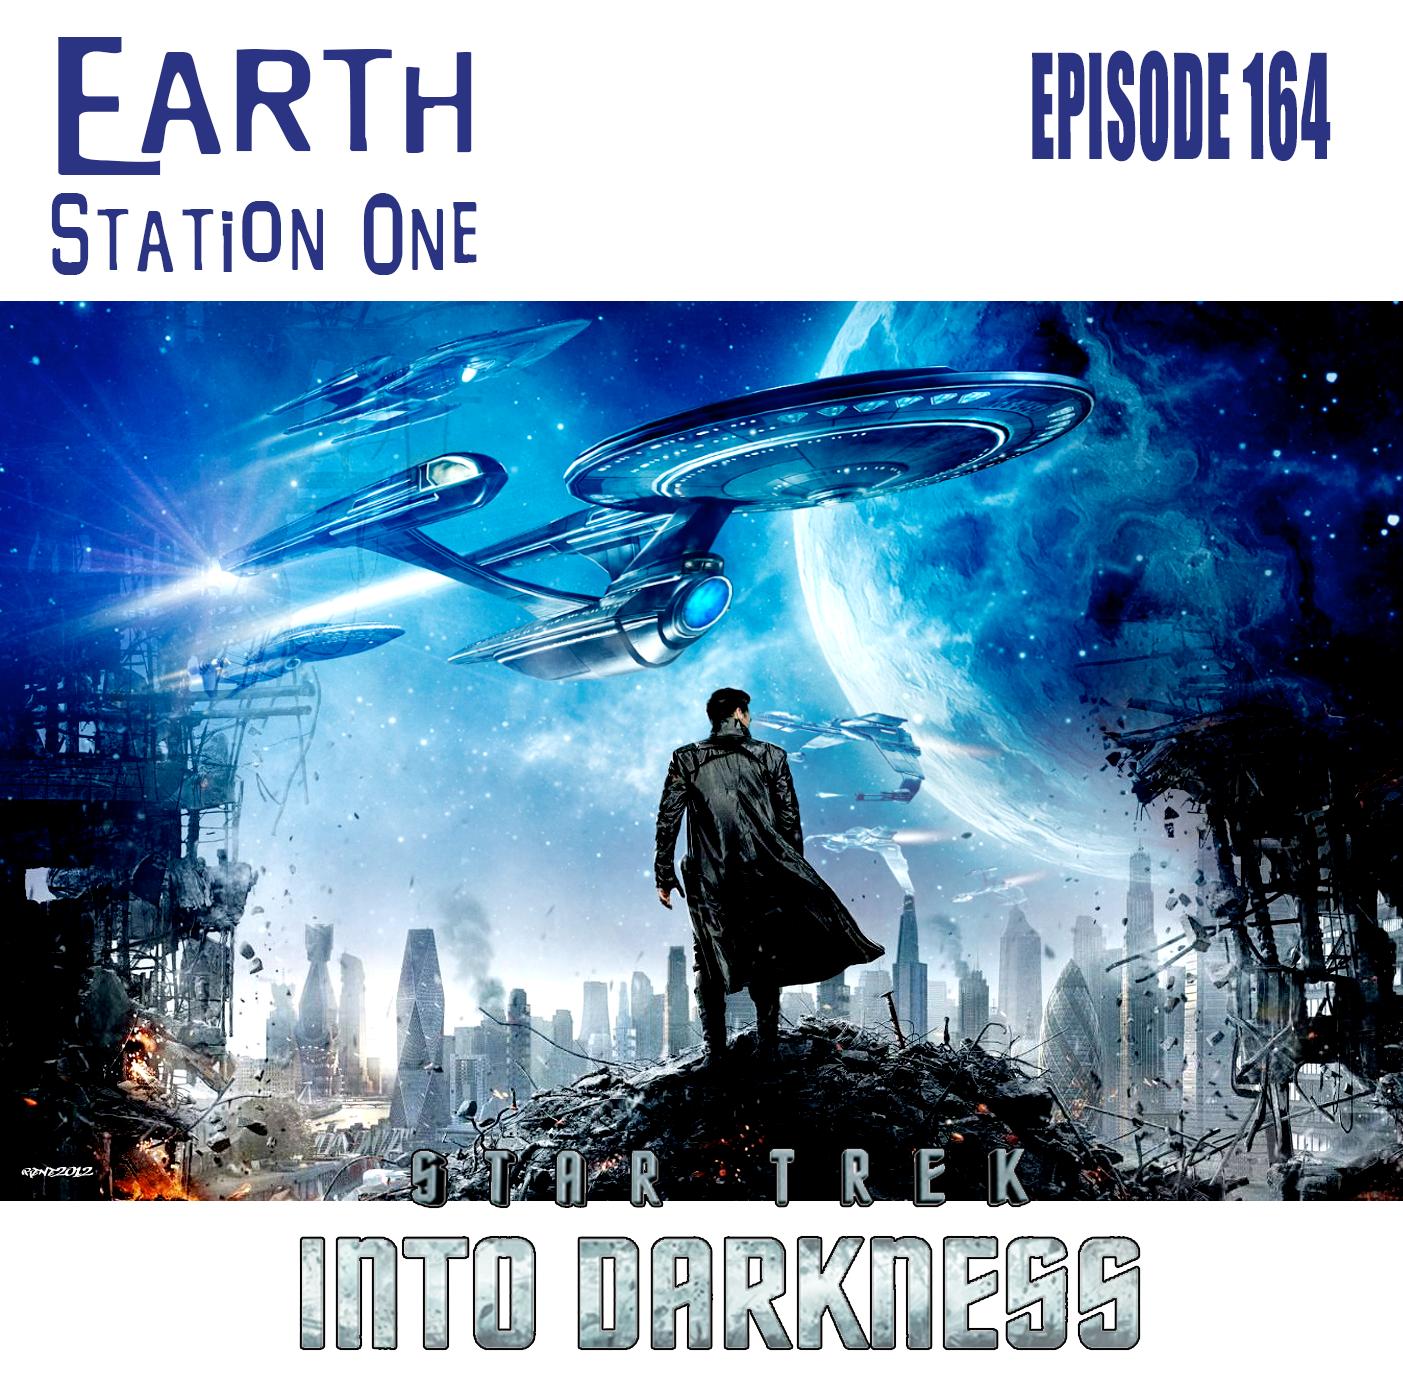 ESO Episode 164 - Star Trek Into the Darkness